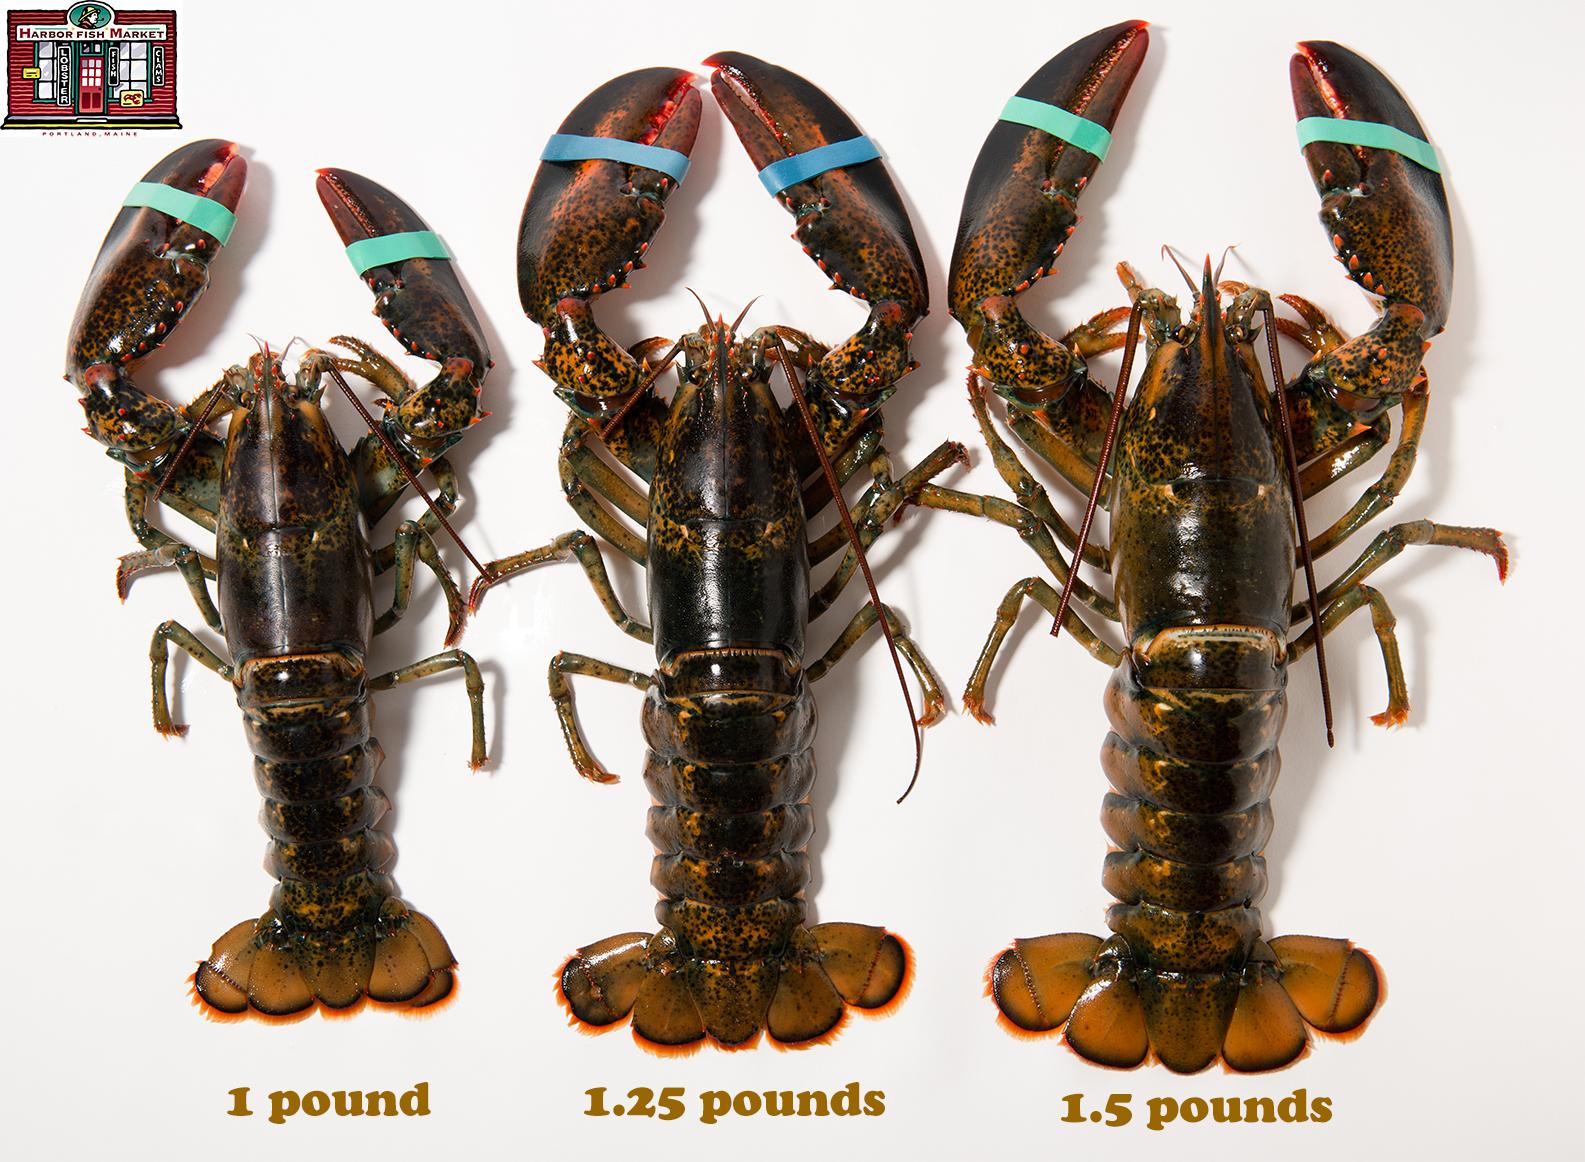 Live Maine Lobster shipped overnight! • Harbor Fish Market